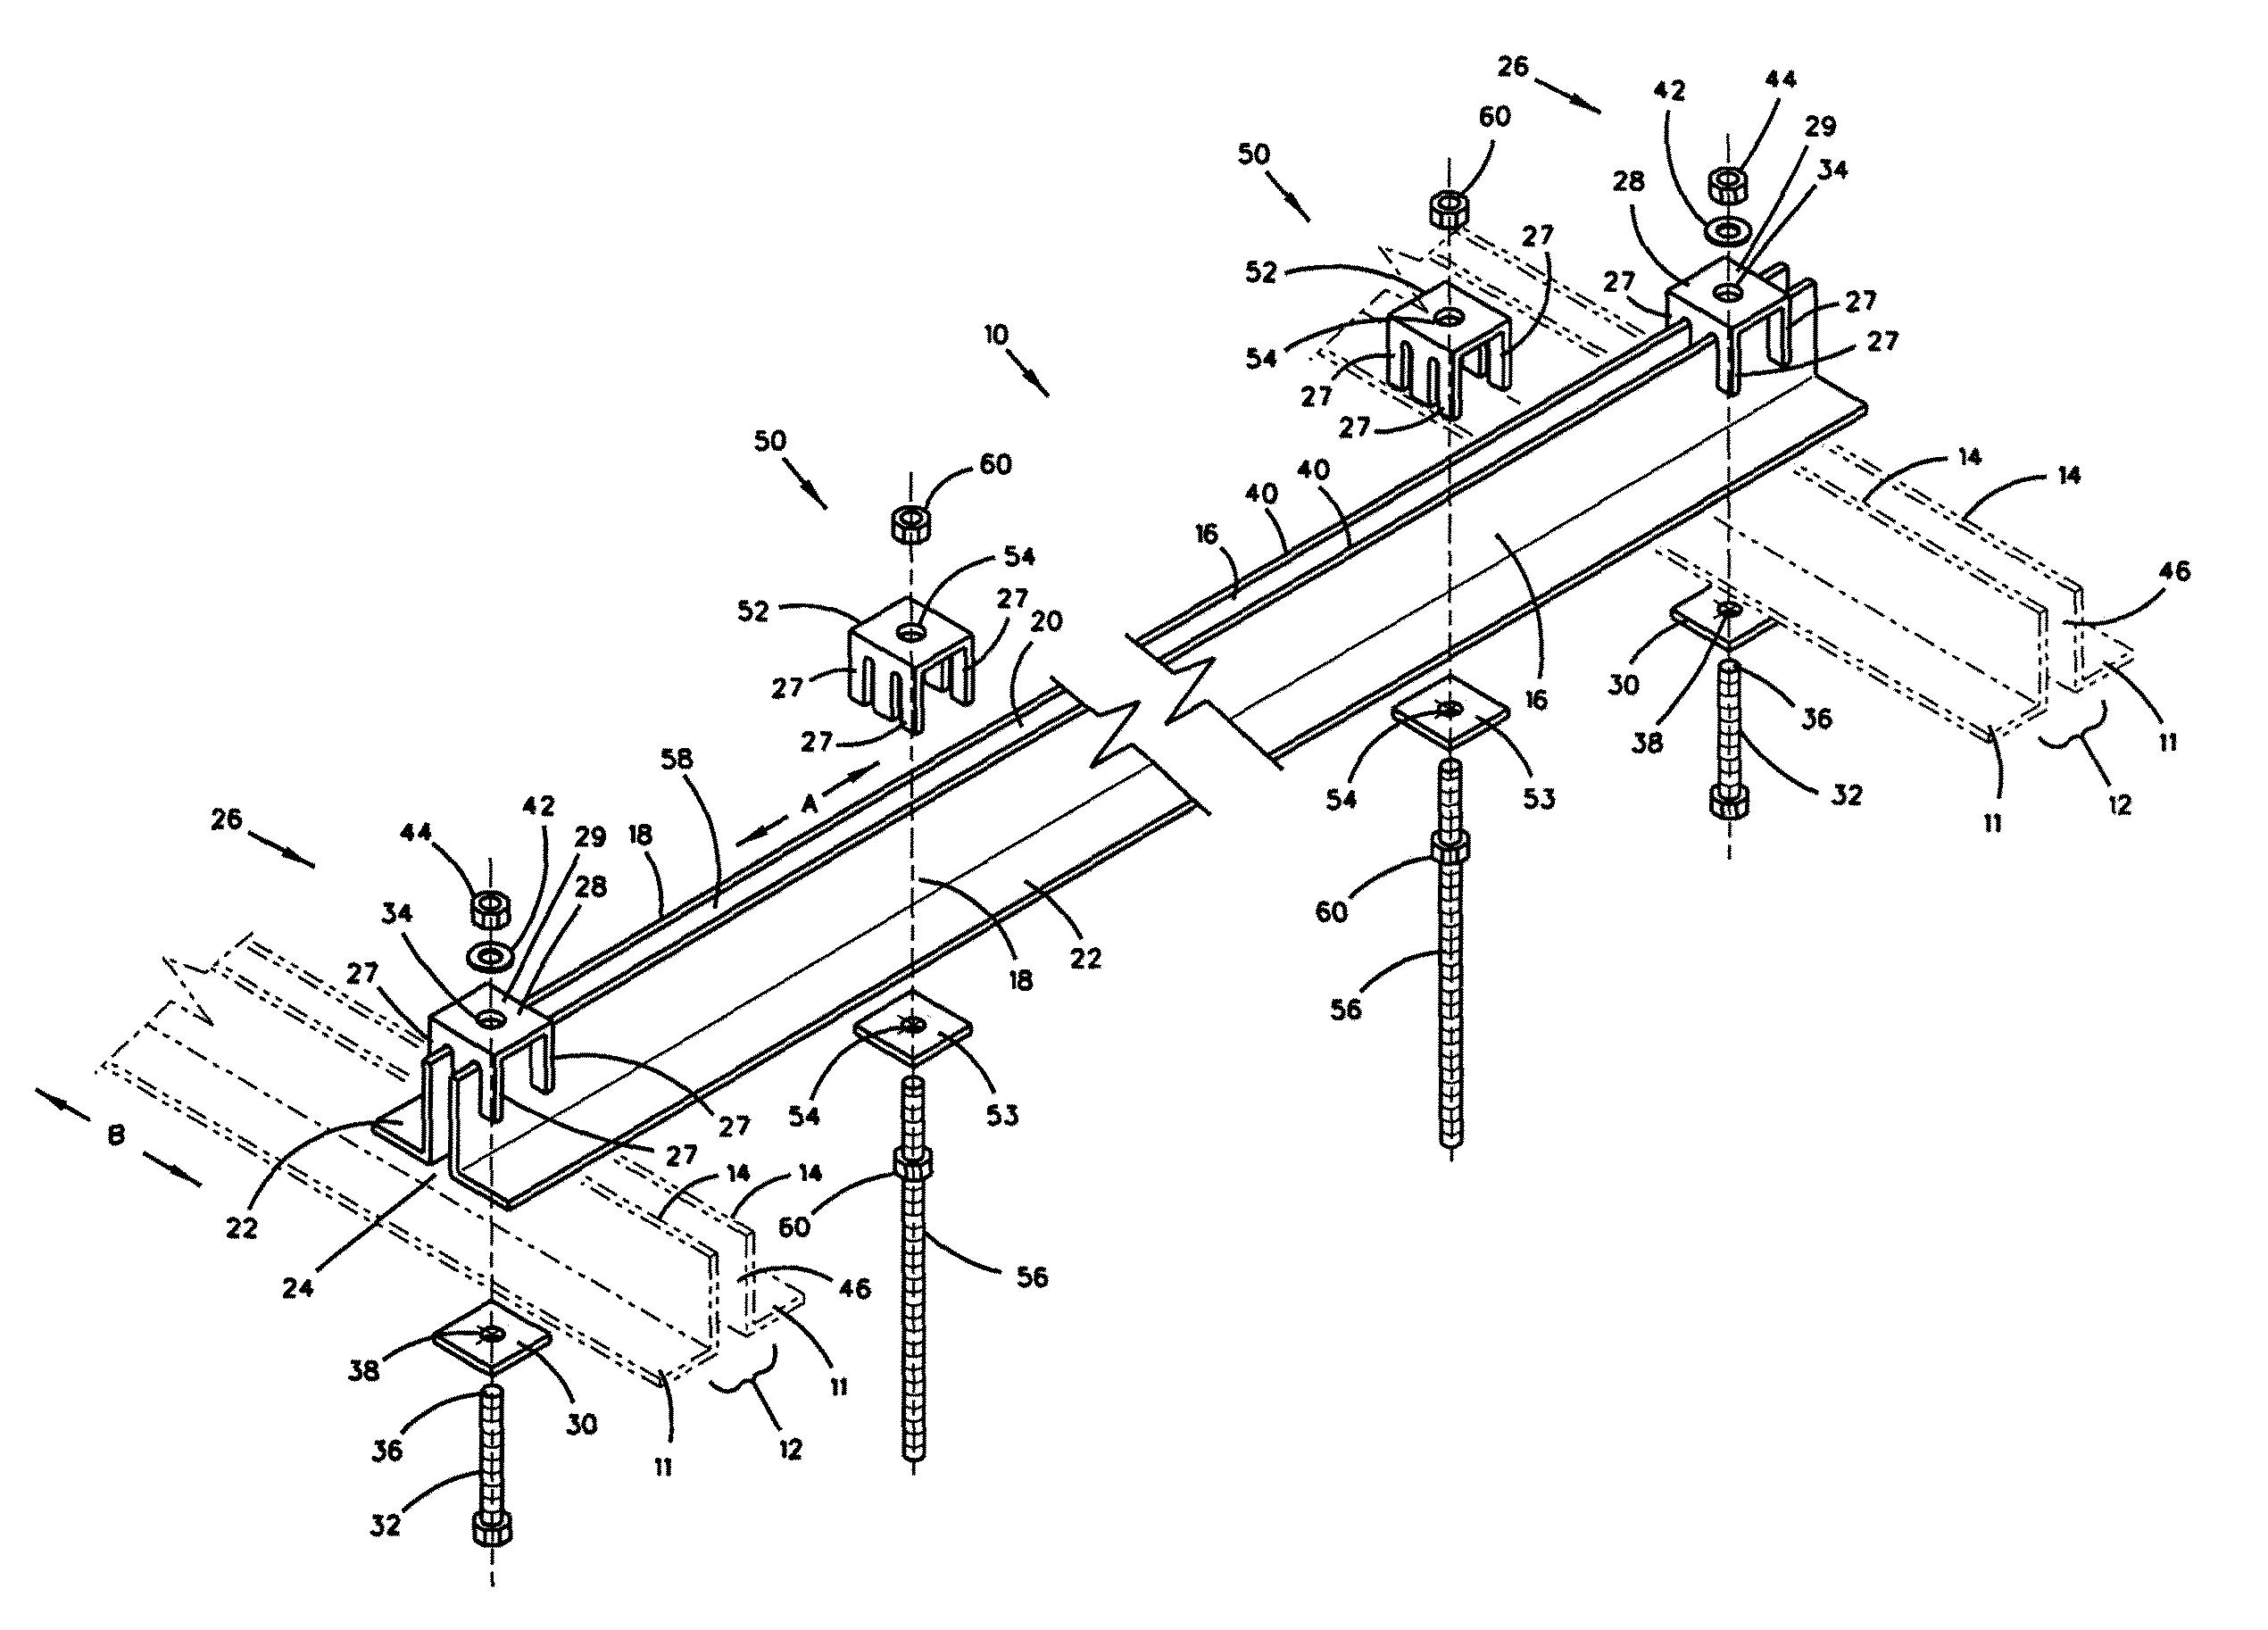 Threaded Rod Load Capacity Chart | Wiring Diagram Database